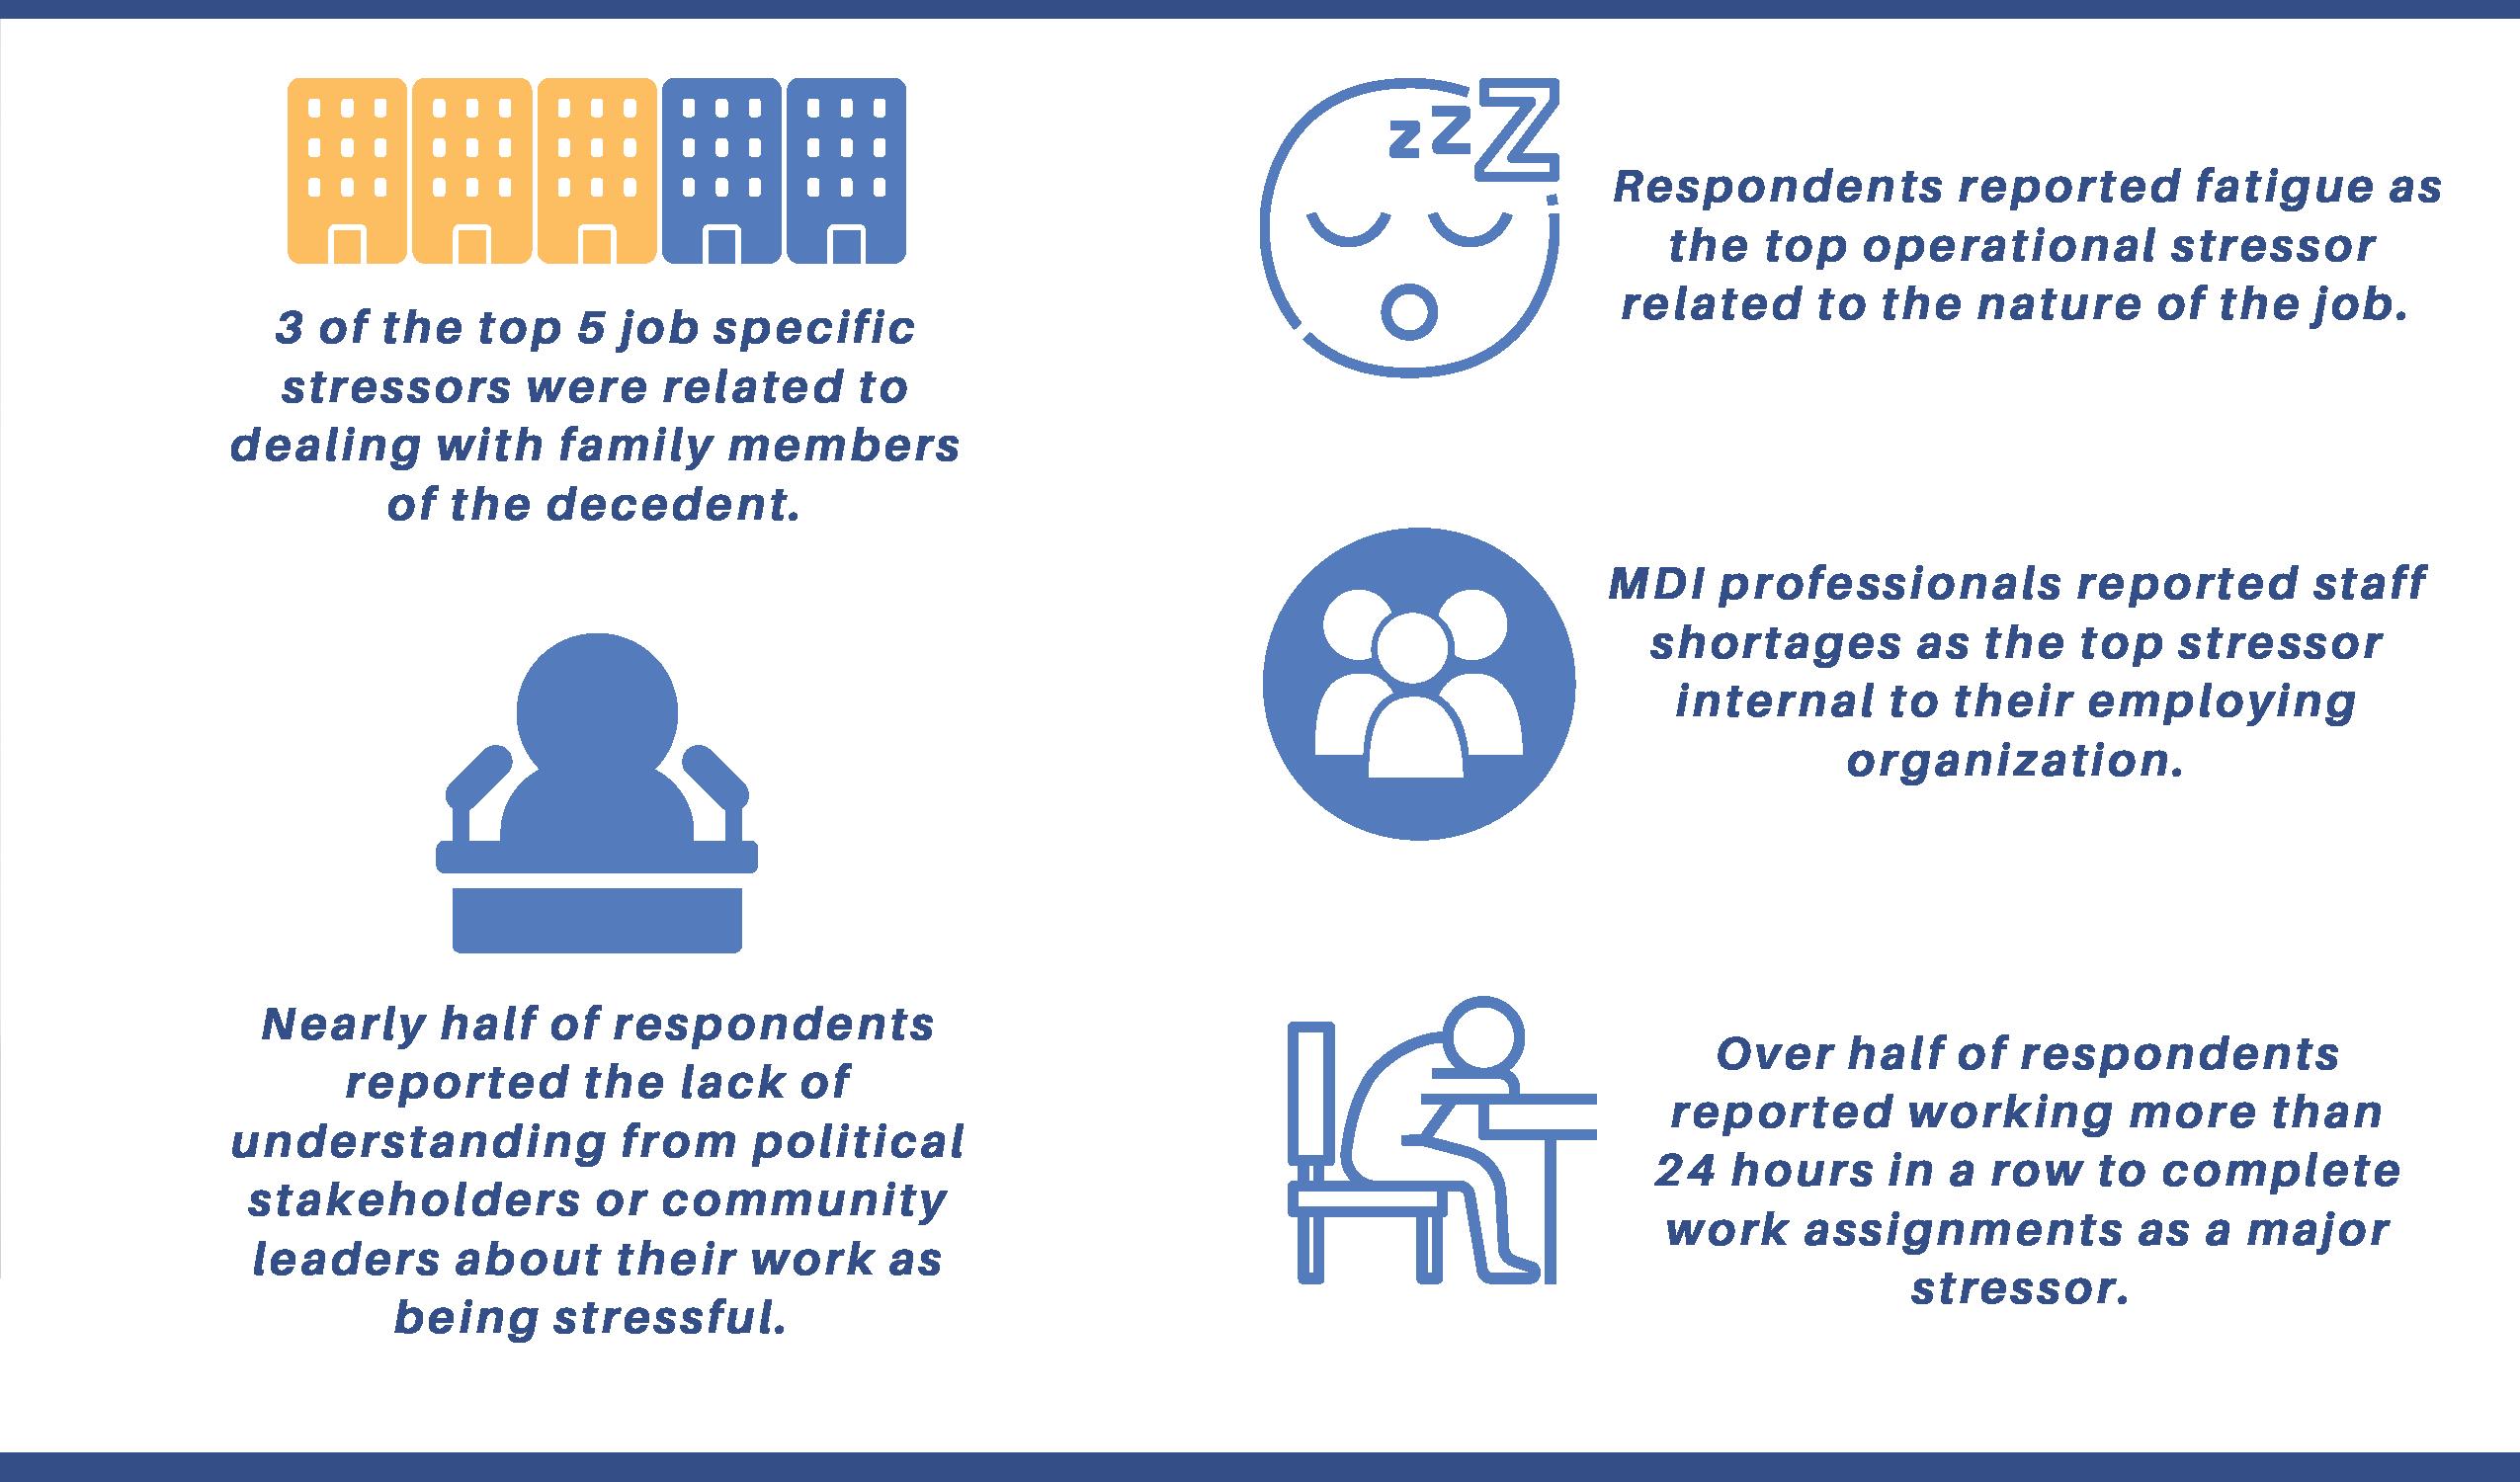 MDI survey infographic